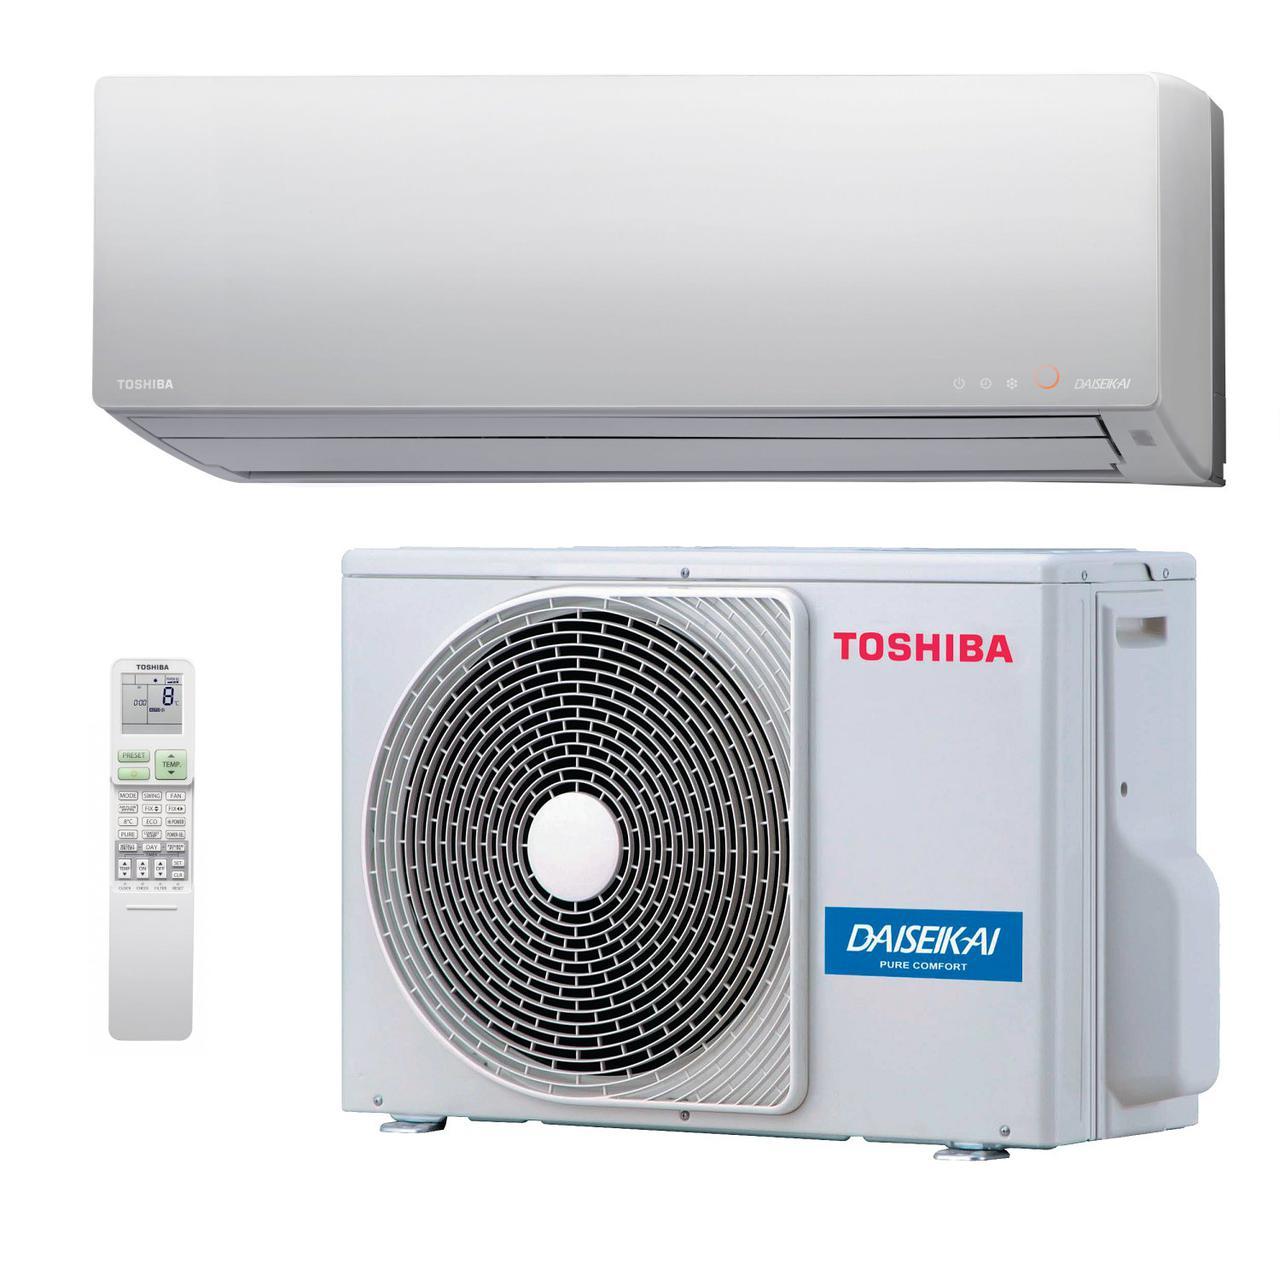 Кондиционер Toshiba RAS-35G2KVP-ND/RAS-35G2AVP-ND